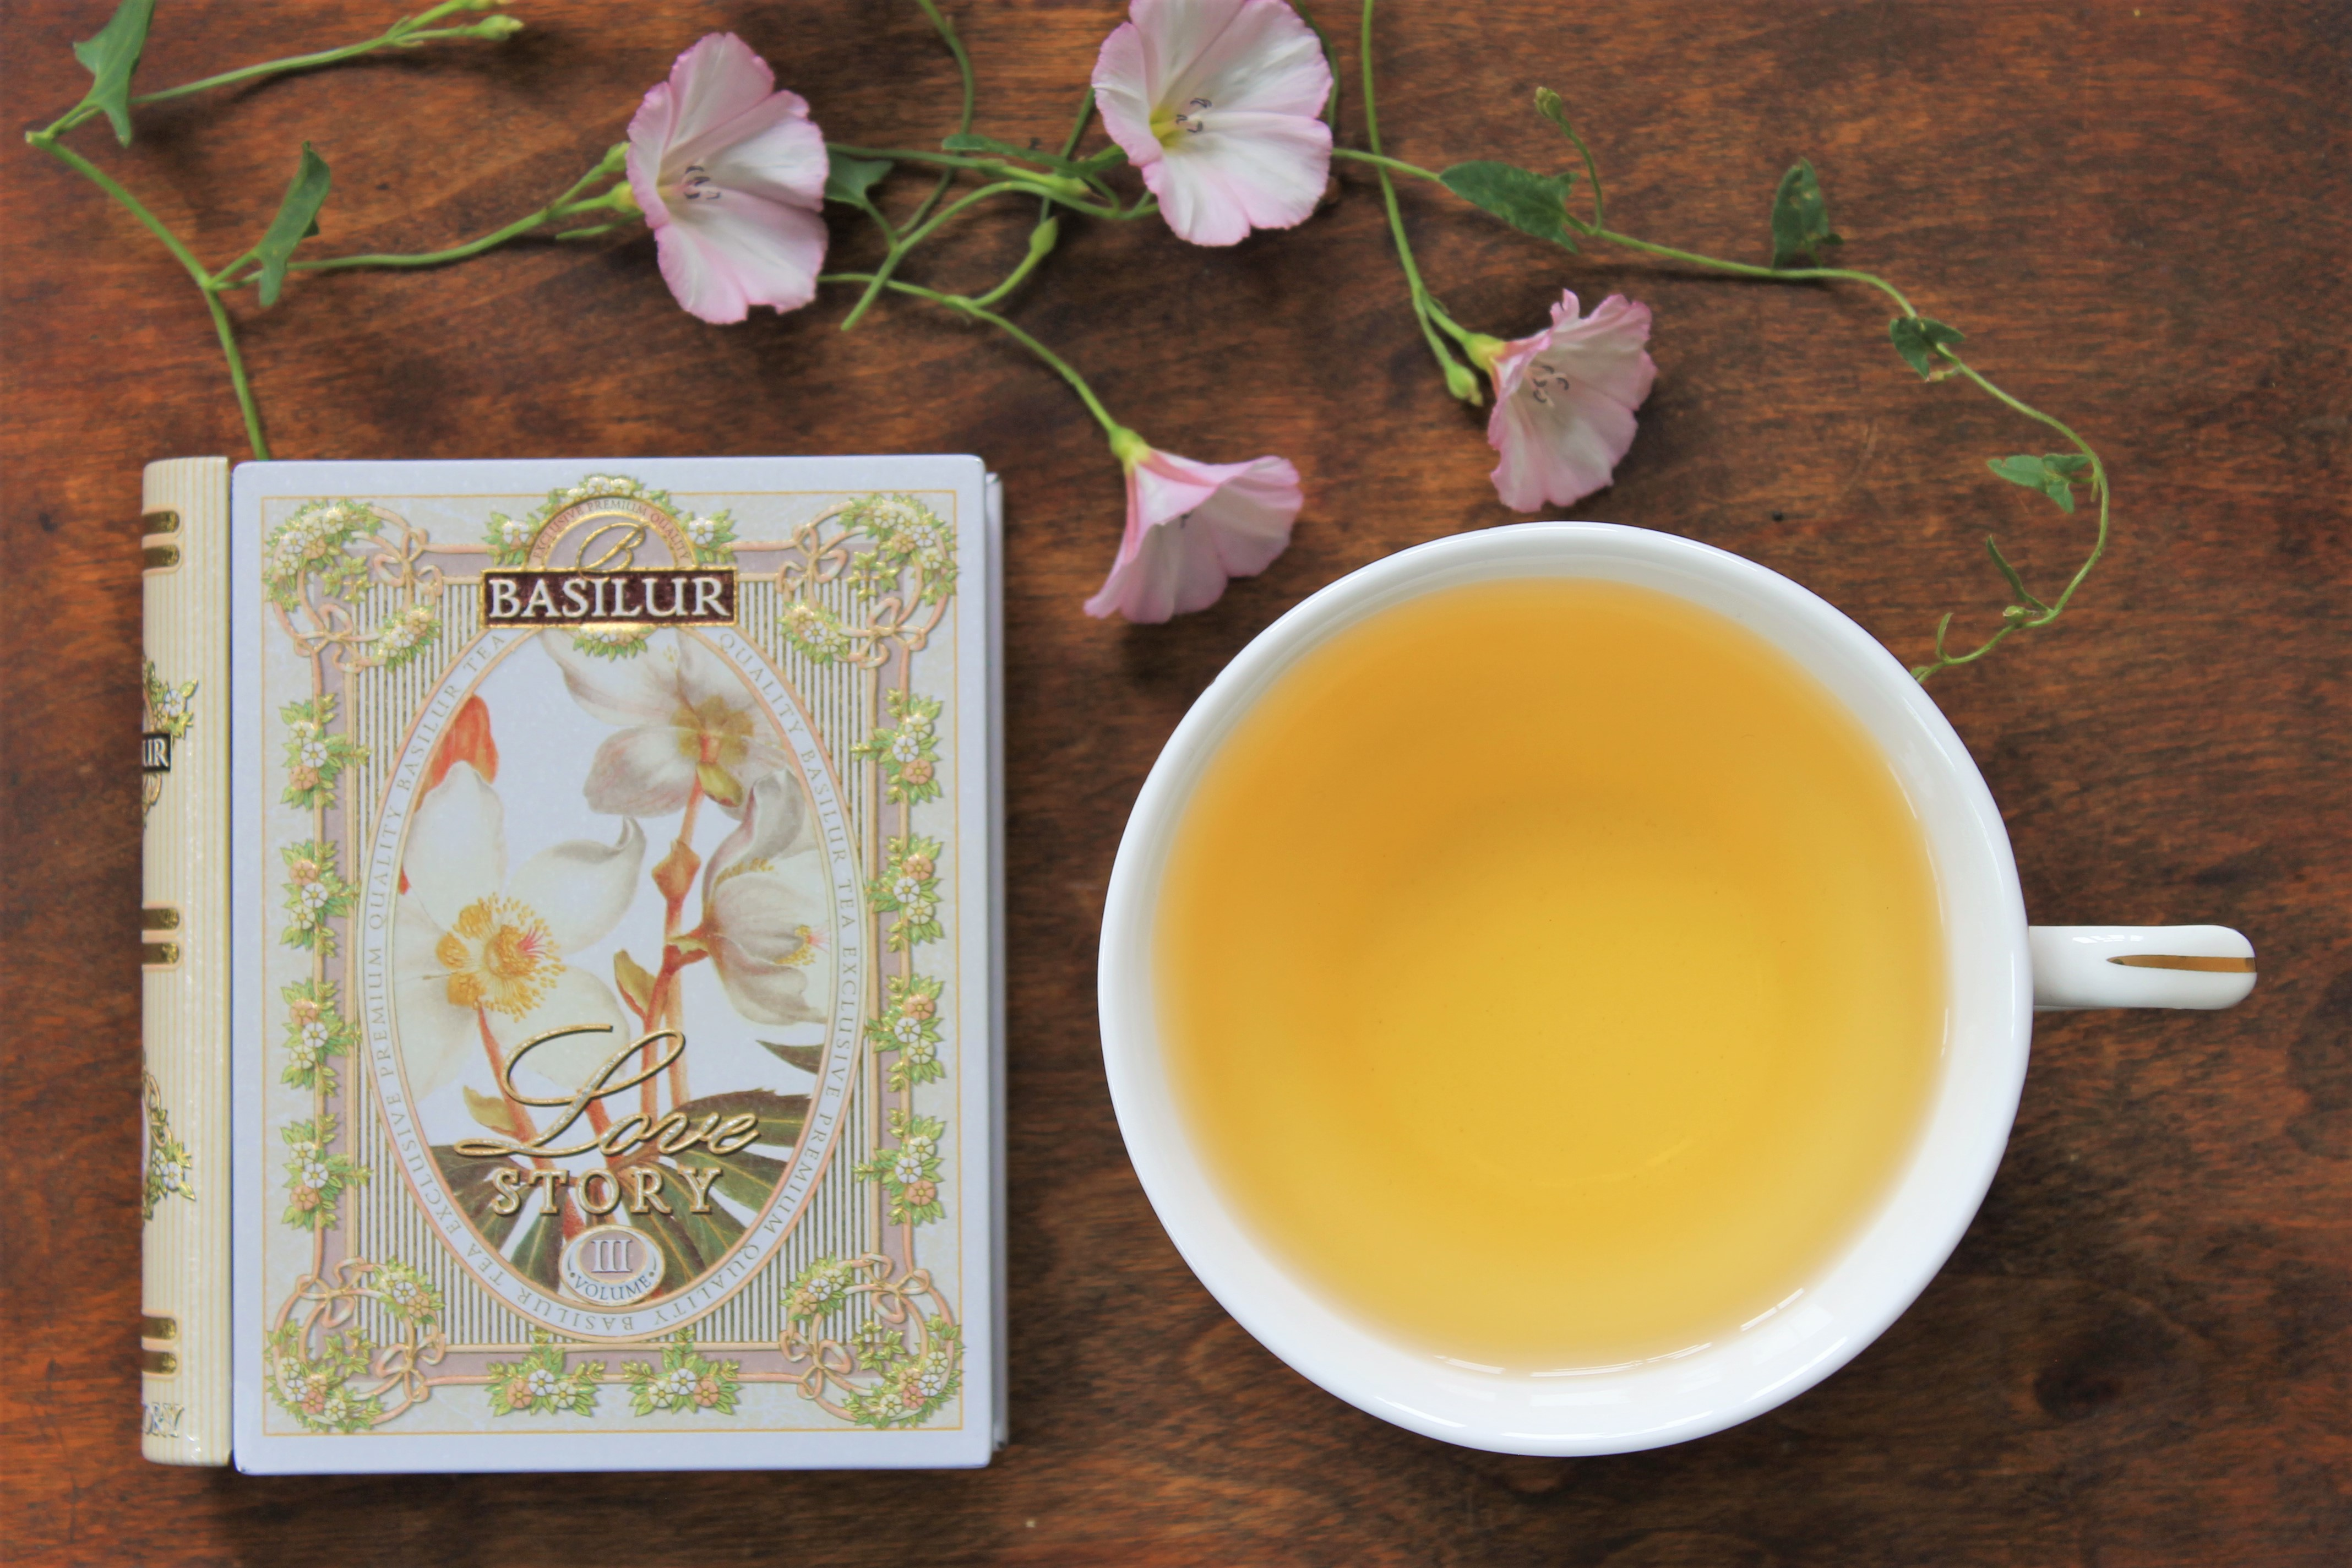 Basilur Love Story Volume III Tea Review